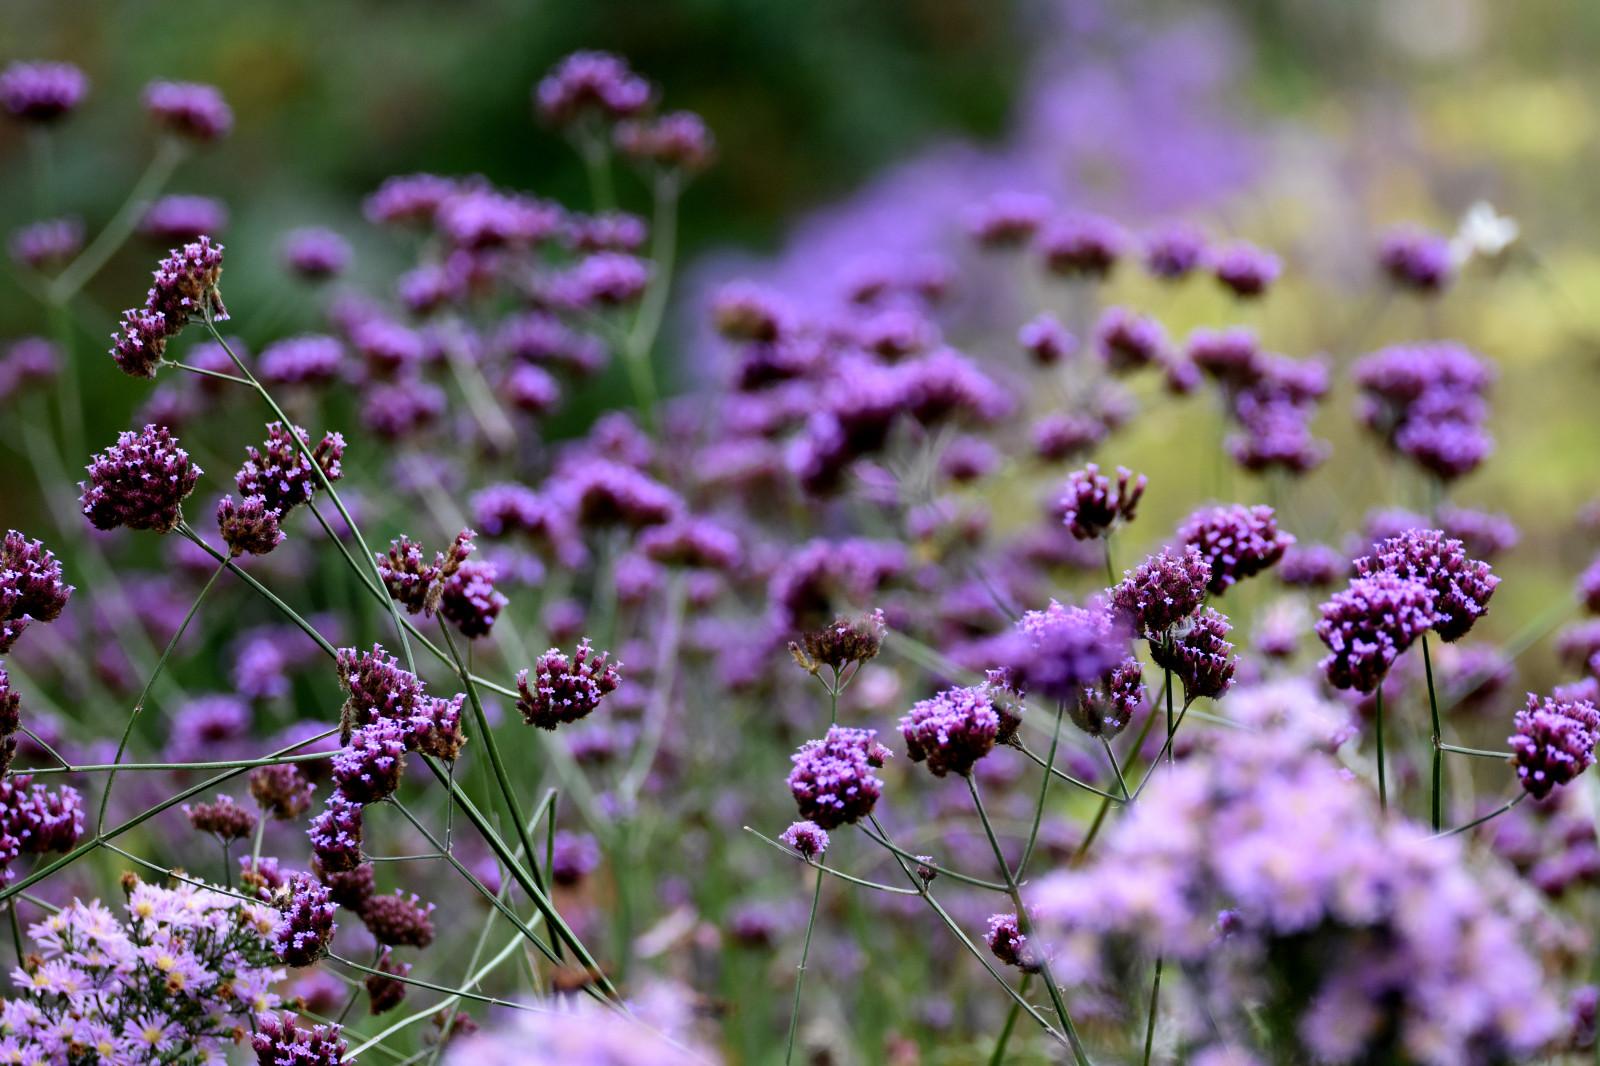 Wallpaper Flowers Garden Nature Purple Lavender Bokeh